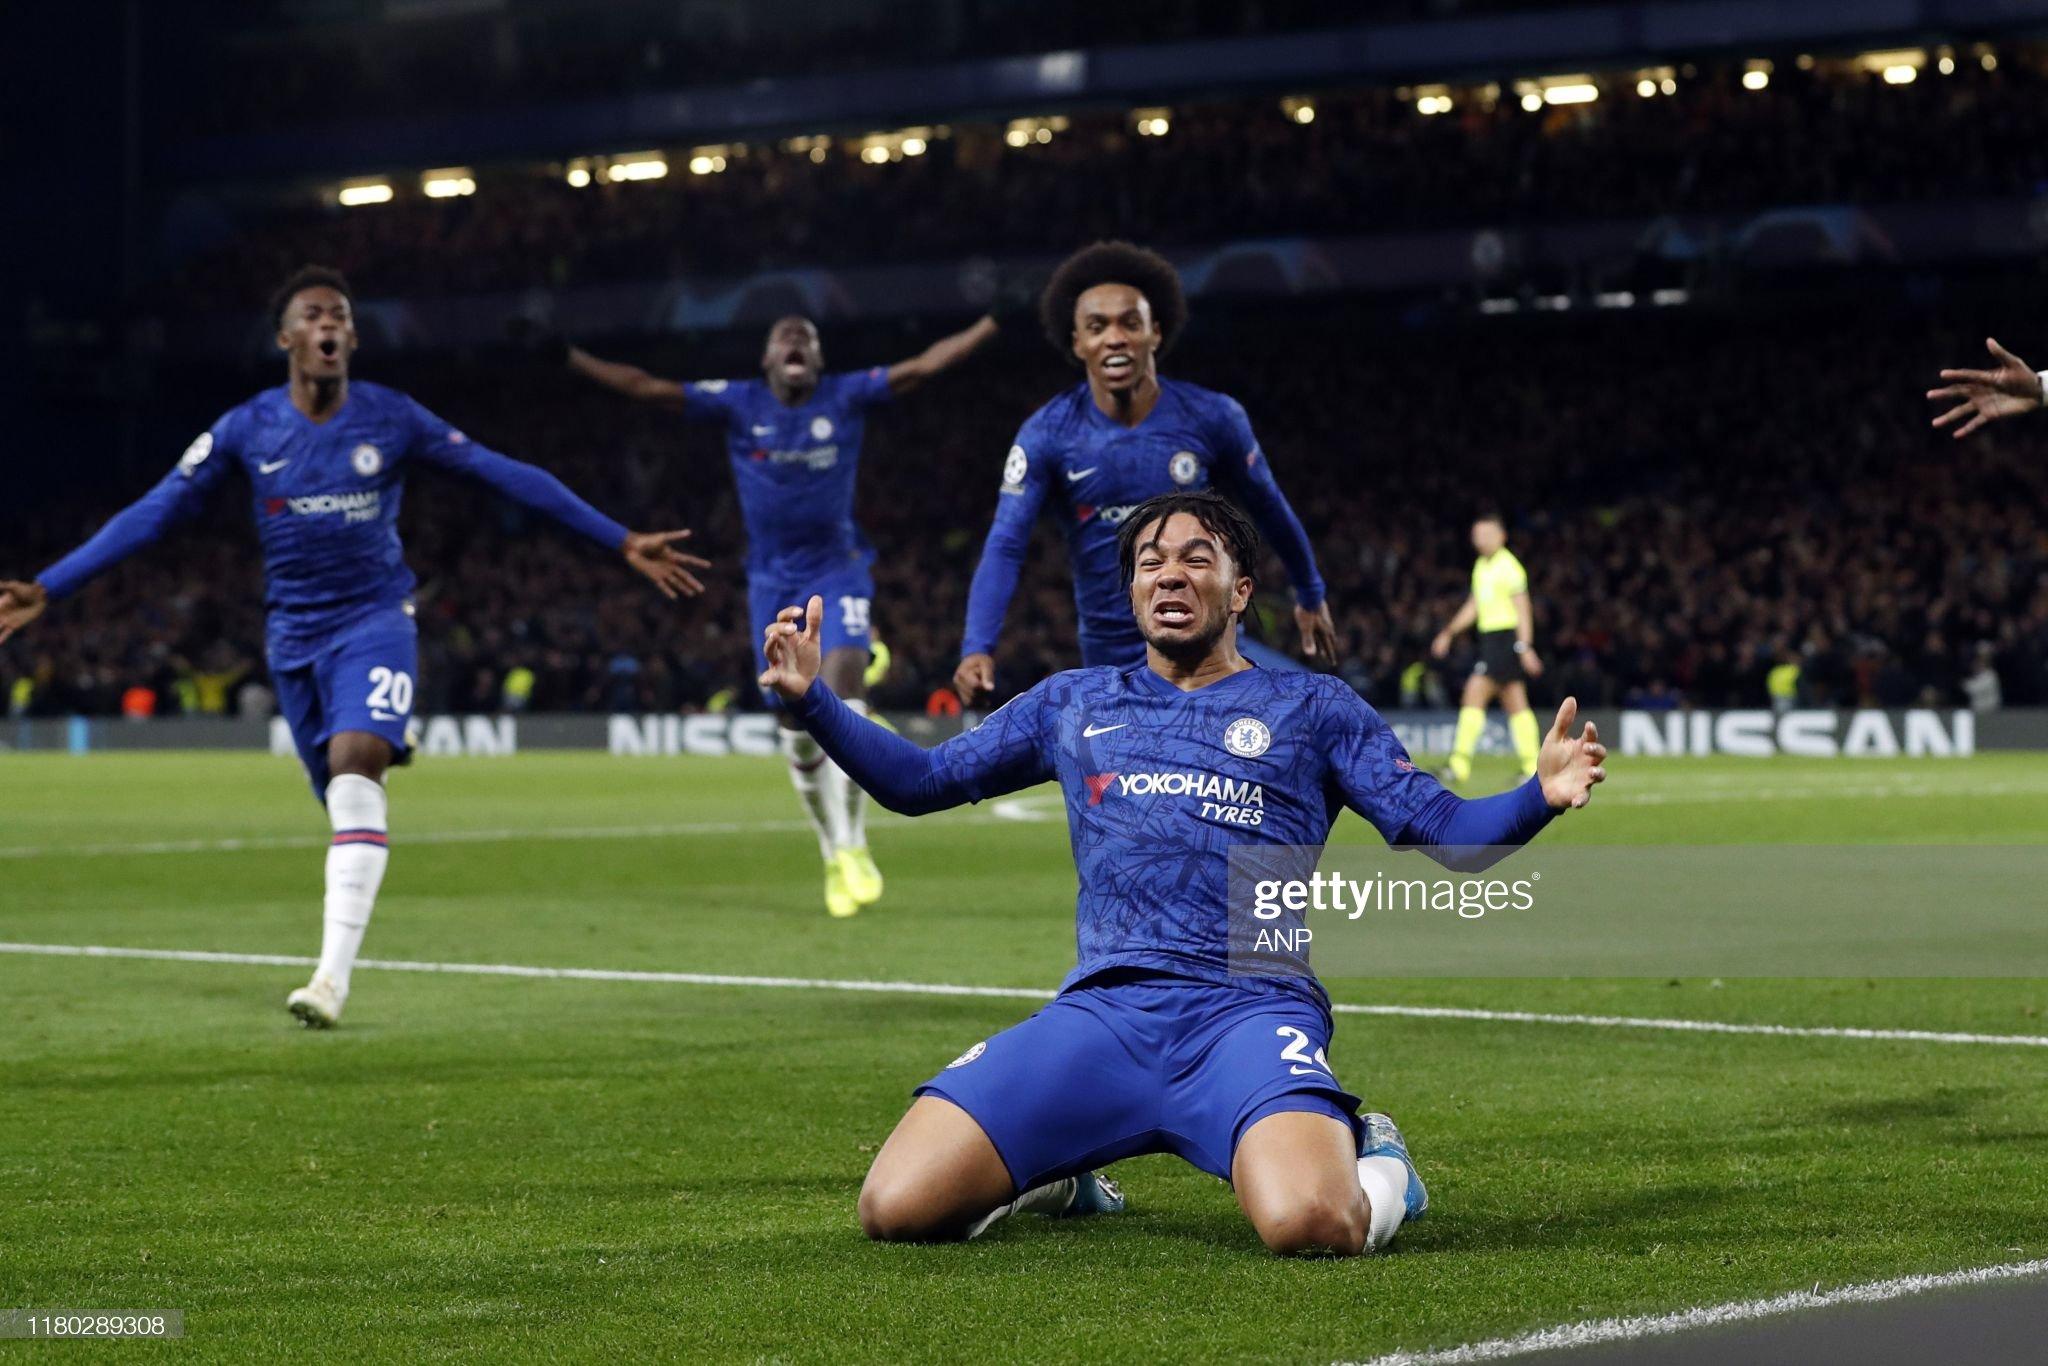 "UEFA Champions League""Chelsea FC v Ajax Amsterdam"" : News Photo"